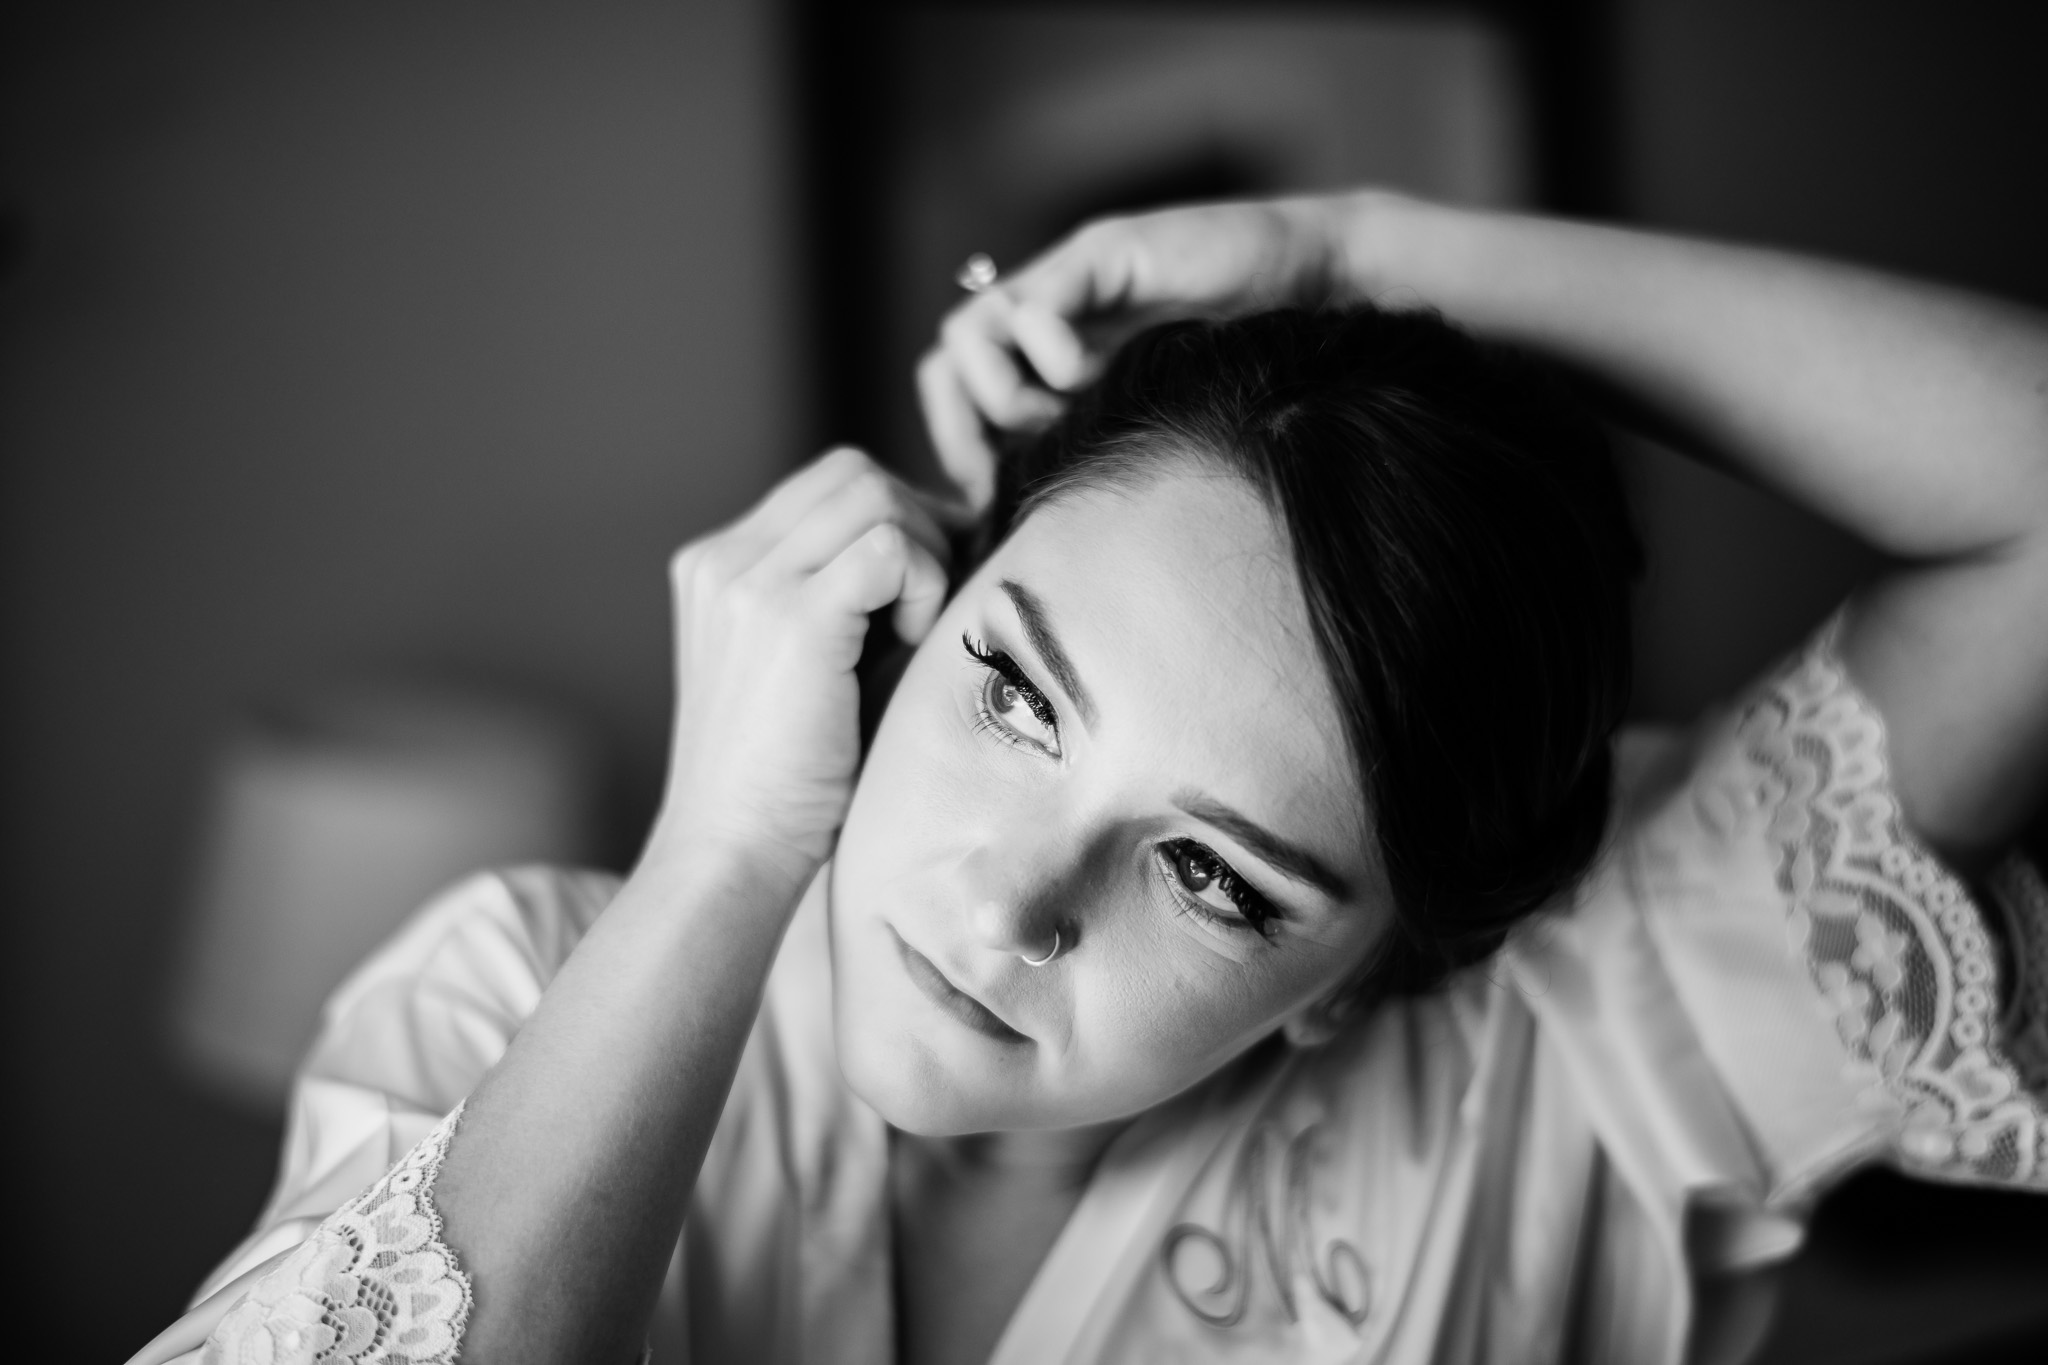 TAMPA_WEDDING_PHOTOGRAPHER_MPMZ_D82_1868_0001.jpg